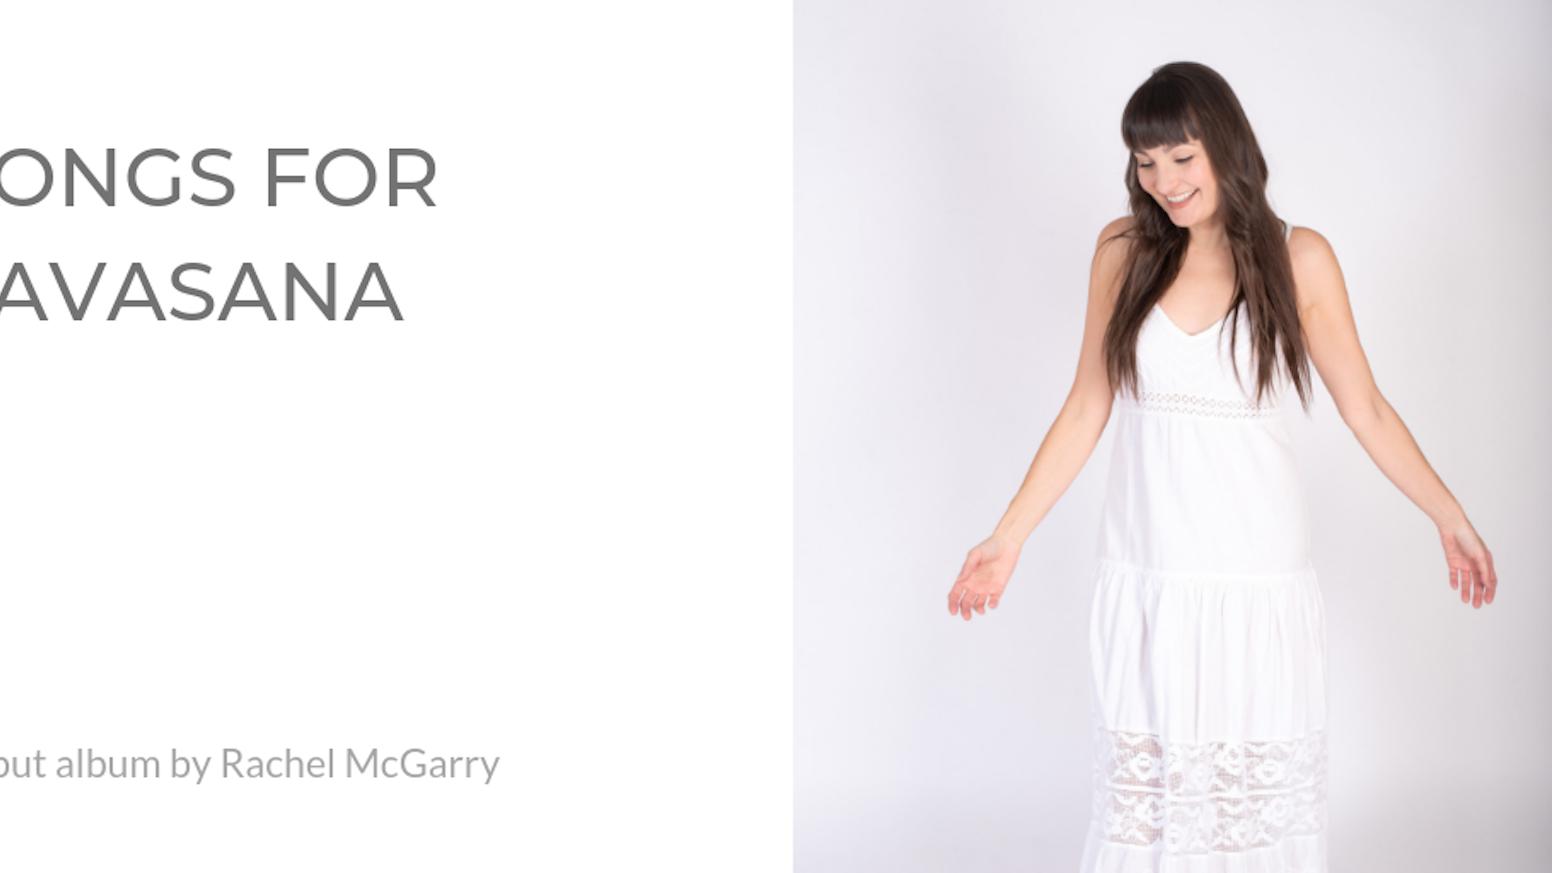 Rachel McGarry's first album of devotional chant music!